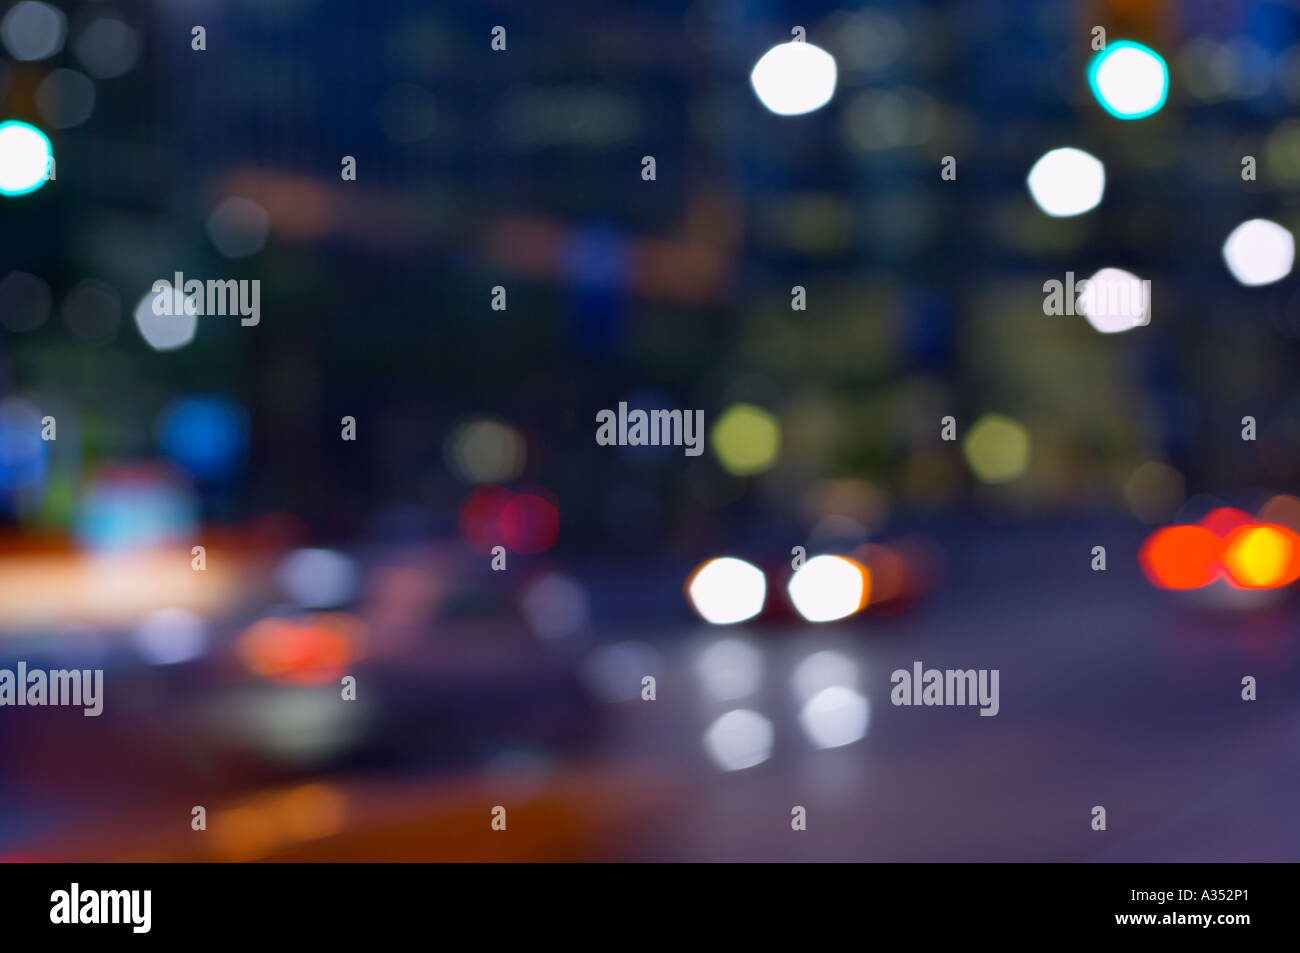 Blurred image of city traffic at dusk. Stock Photo